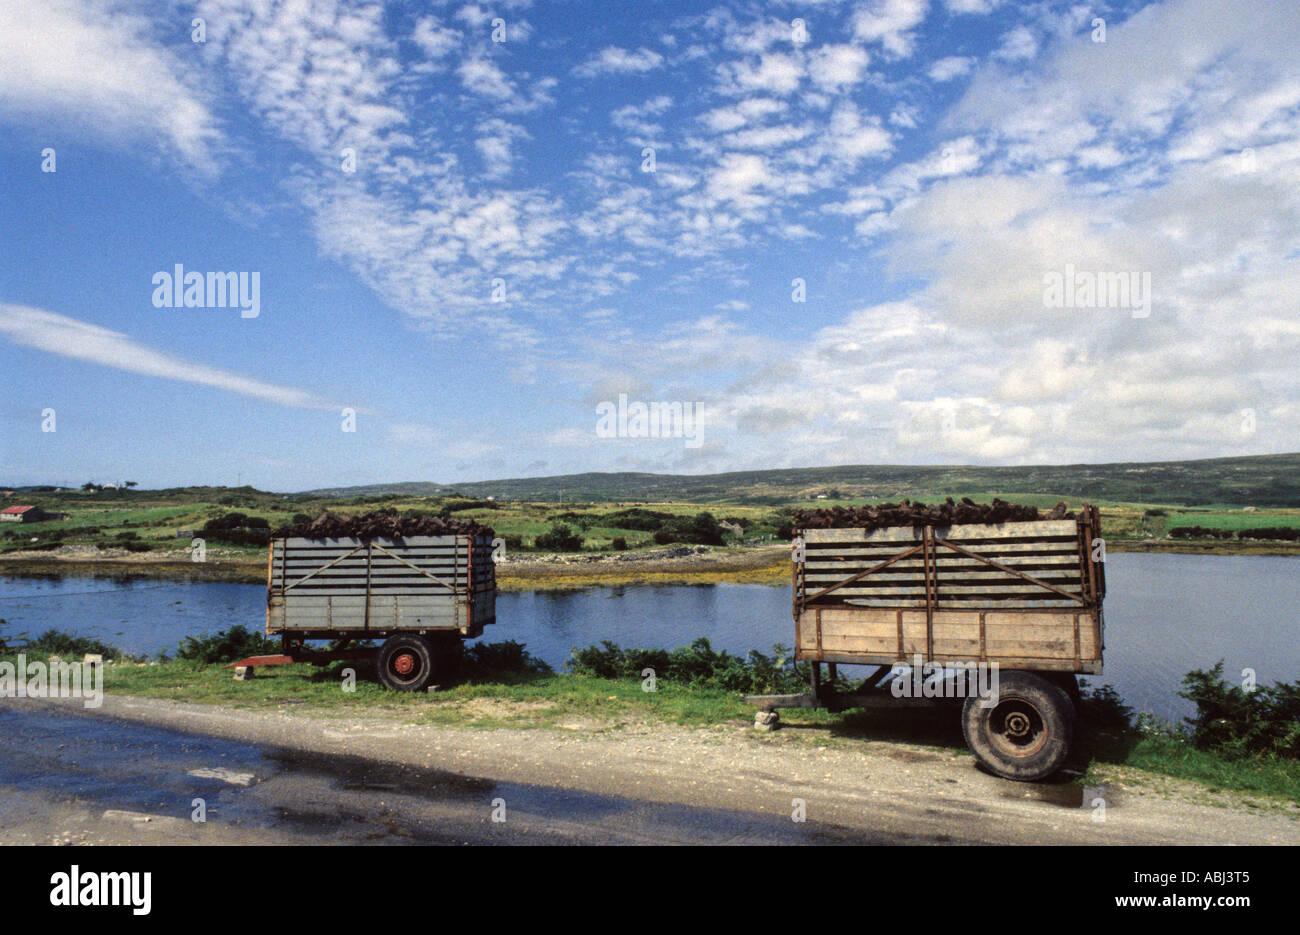 Trailers of turf, Connemara, County Galway, Republic of Ireland - Stock Image